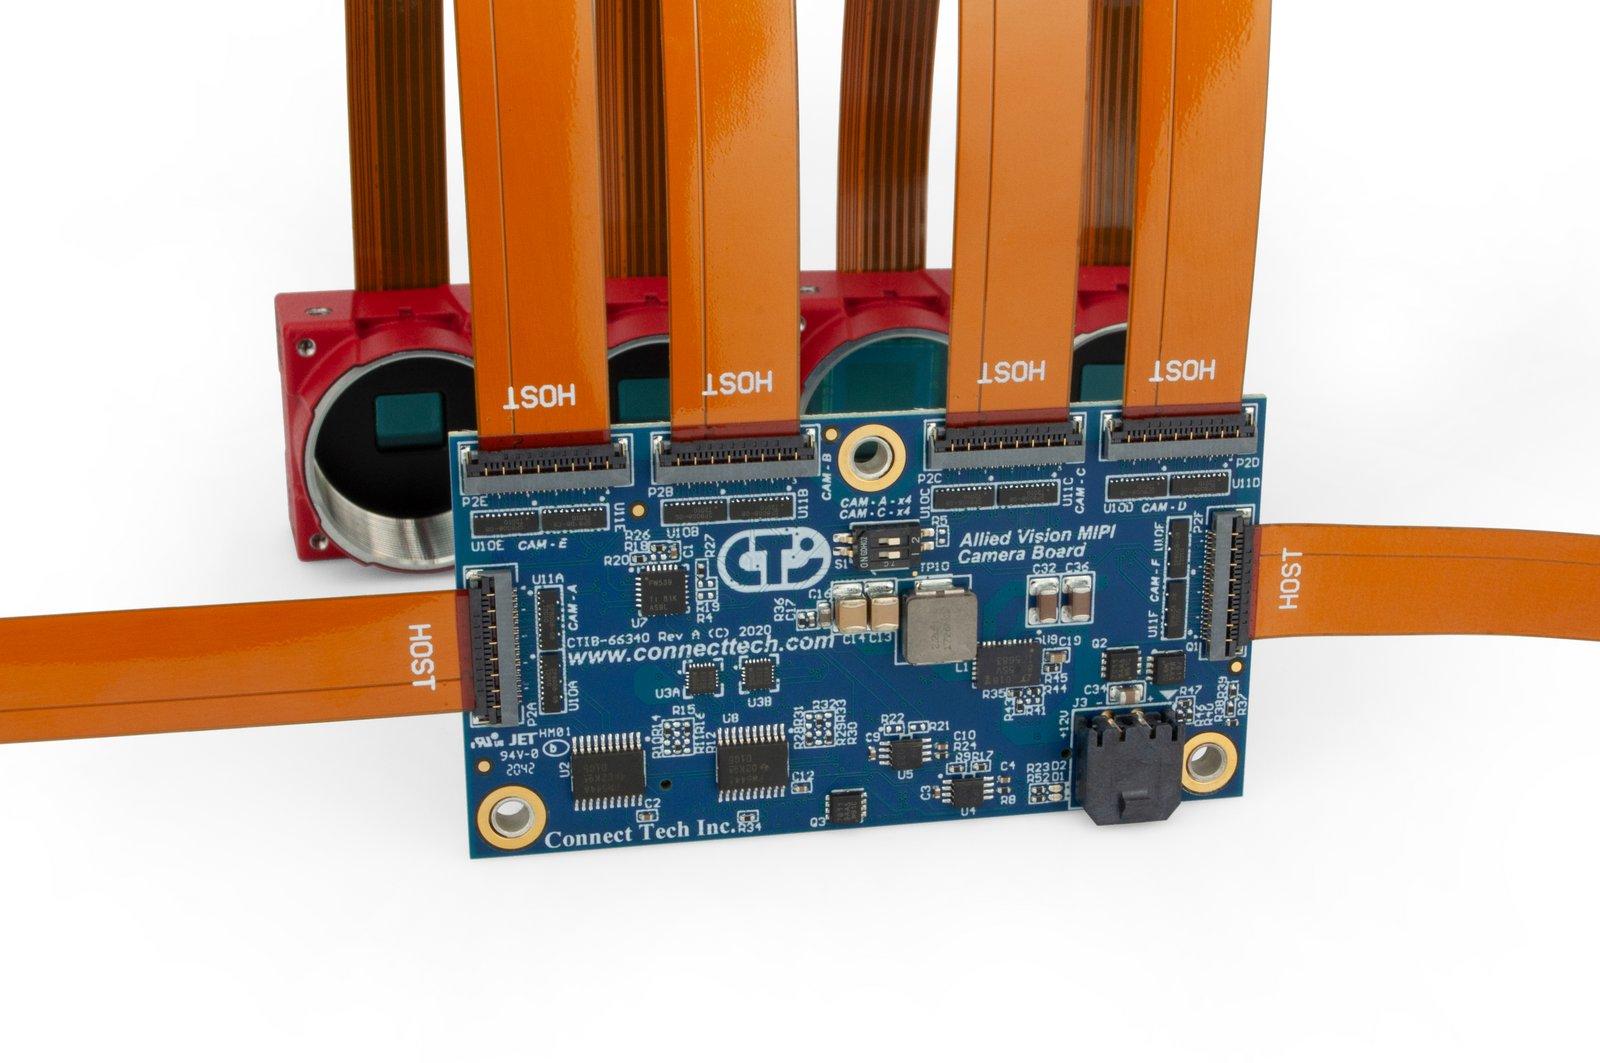 Allied Vision MIPI Camera Board for NVIDIA Jetson AGX Xavier